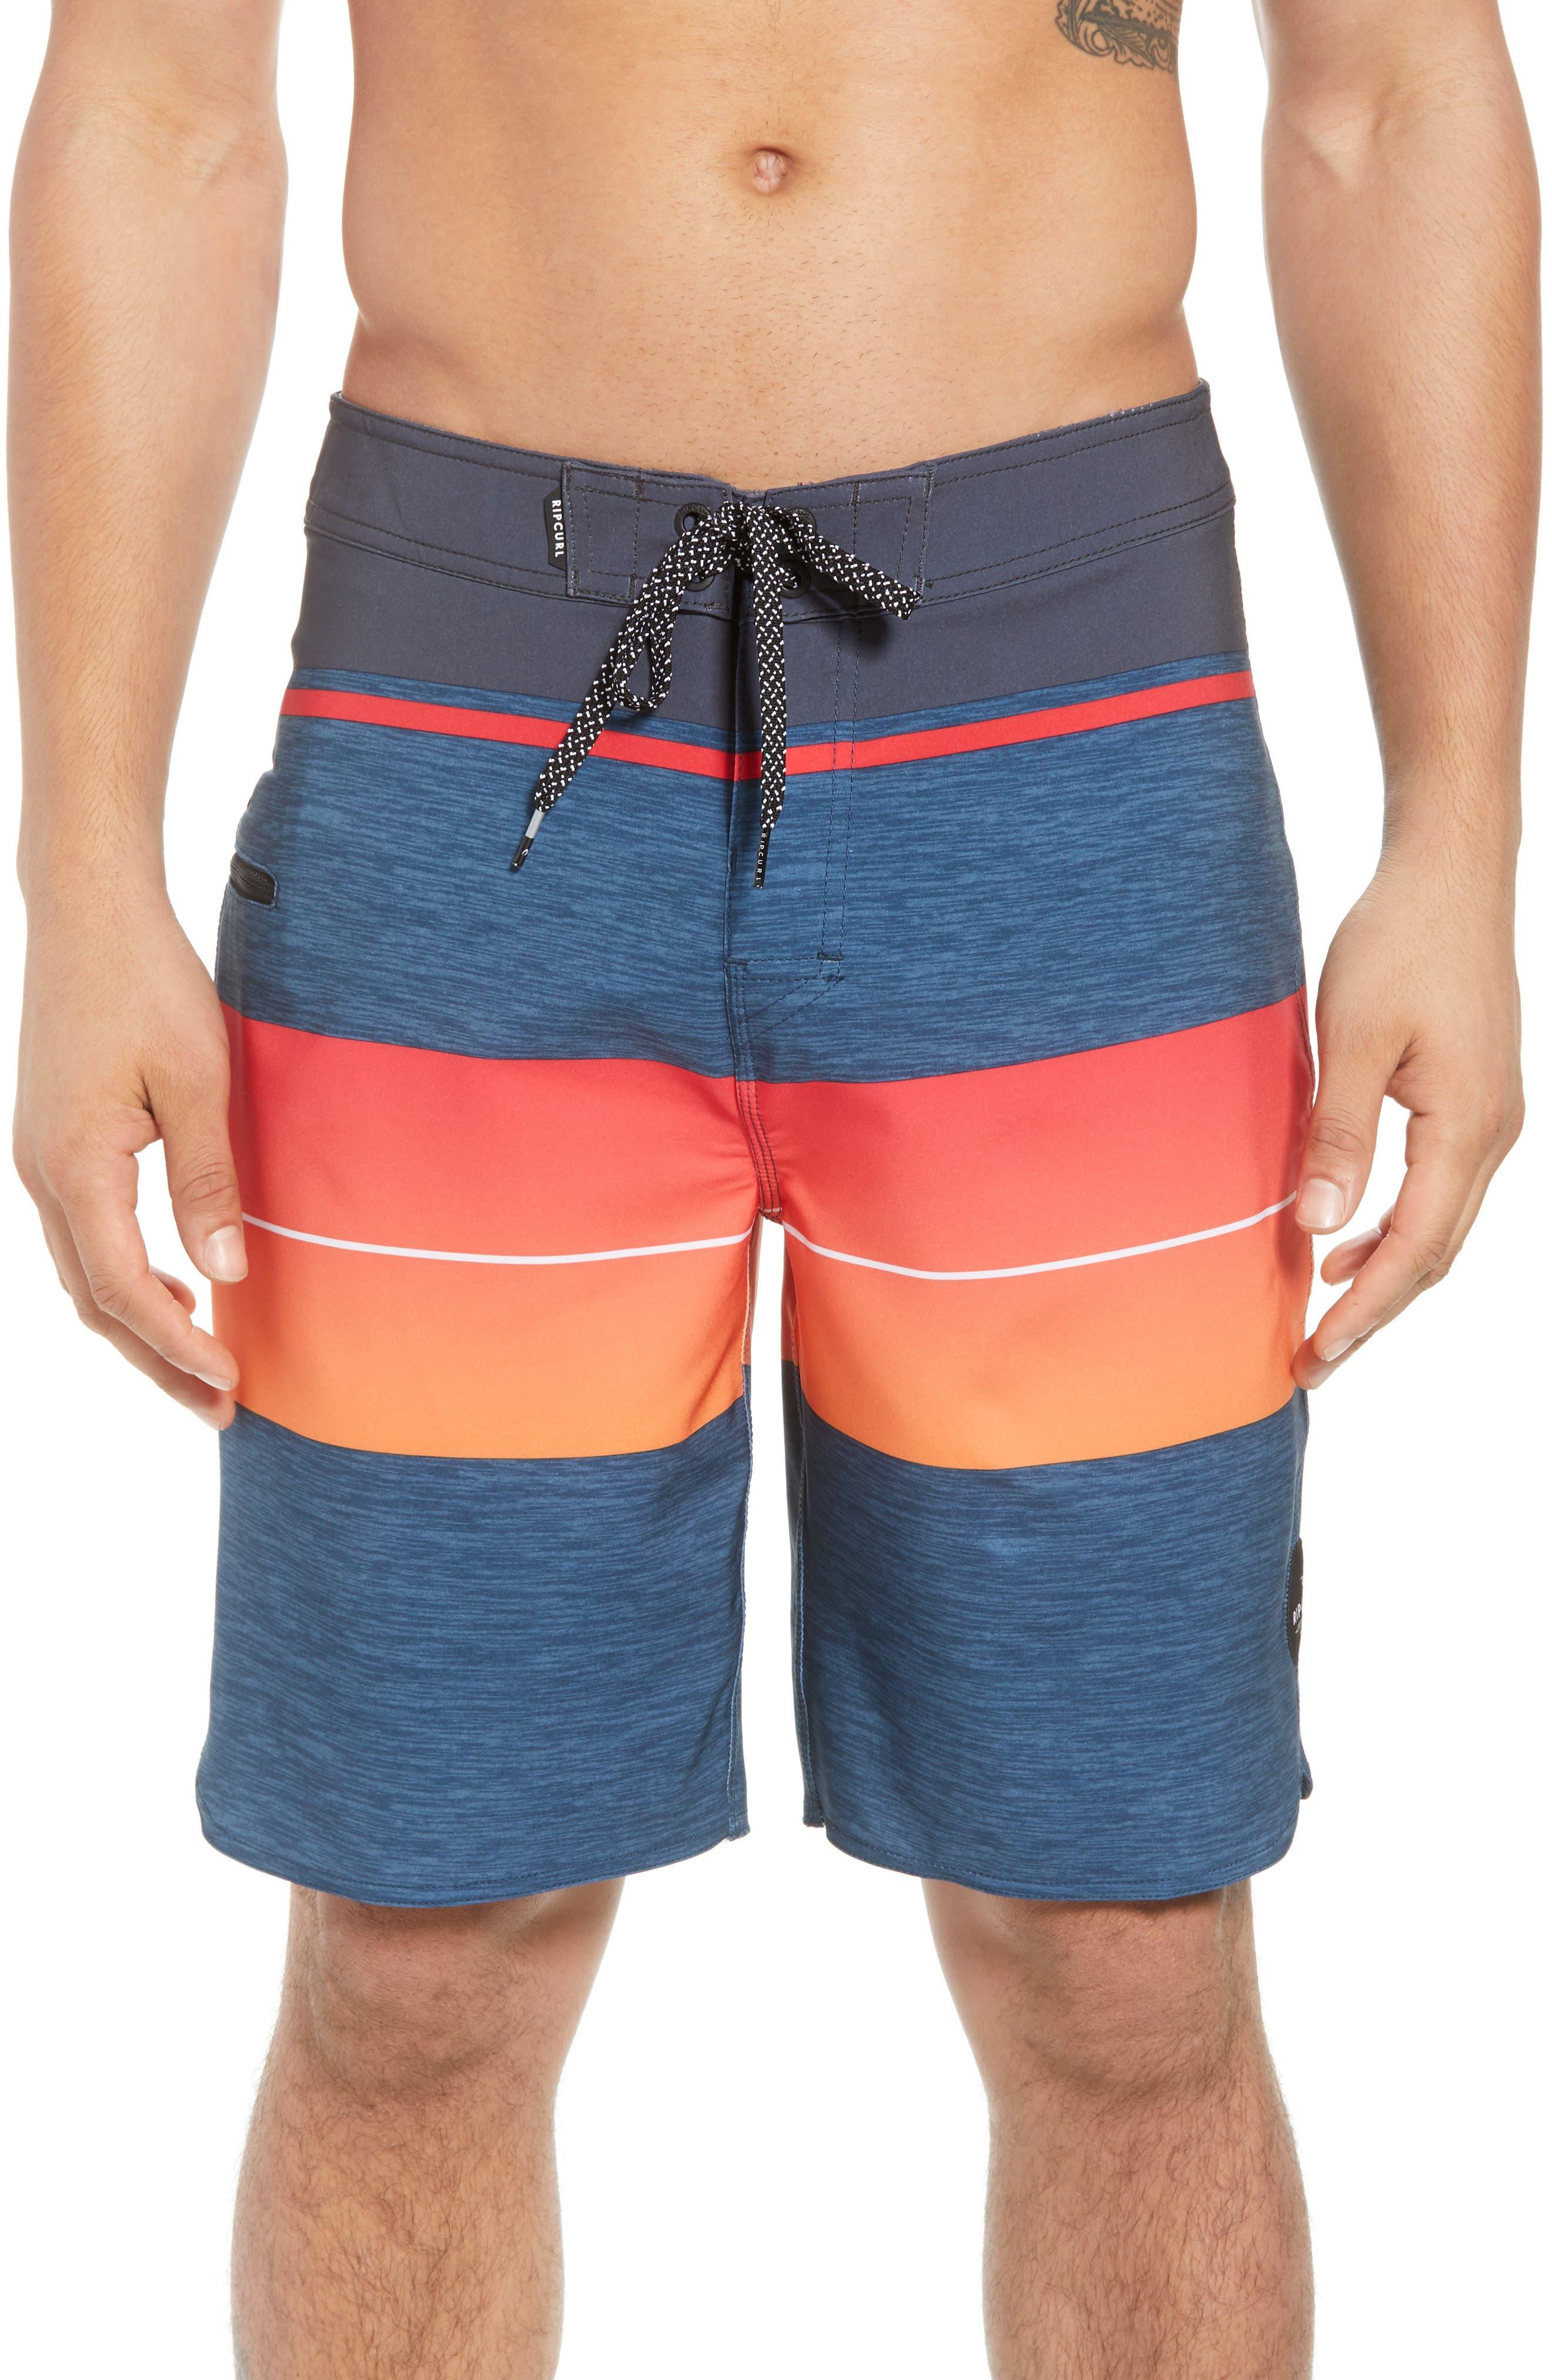 Mirage Eclipse Board Shorts,                             Main thumbnail 1, color,                             Orange